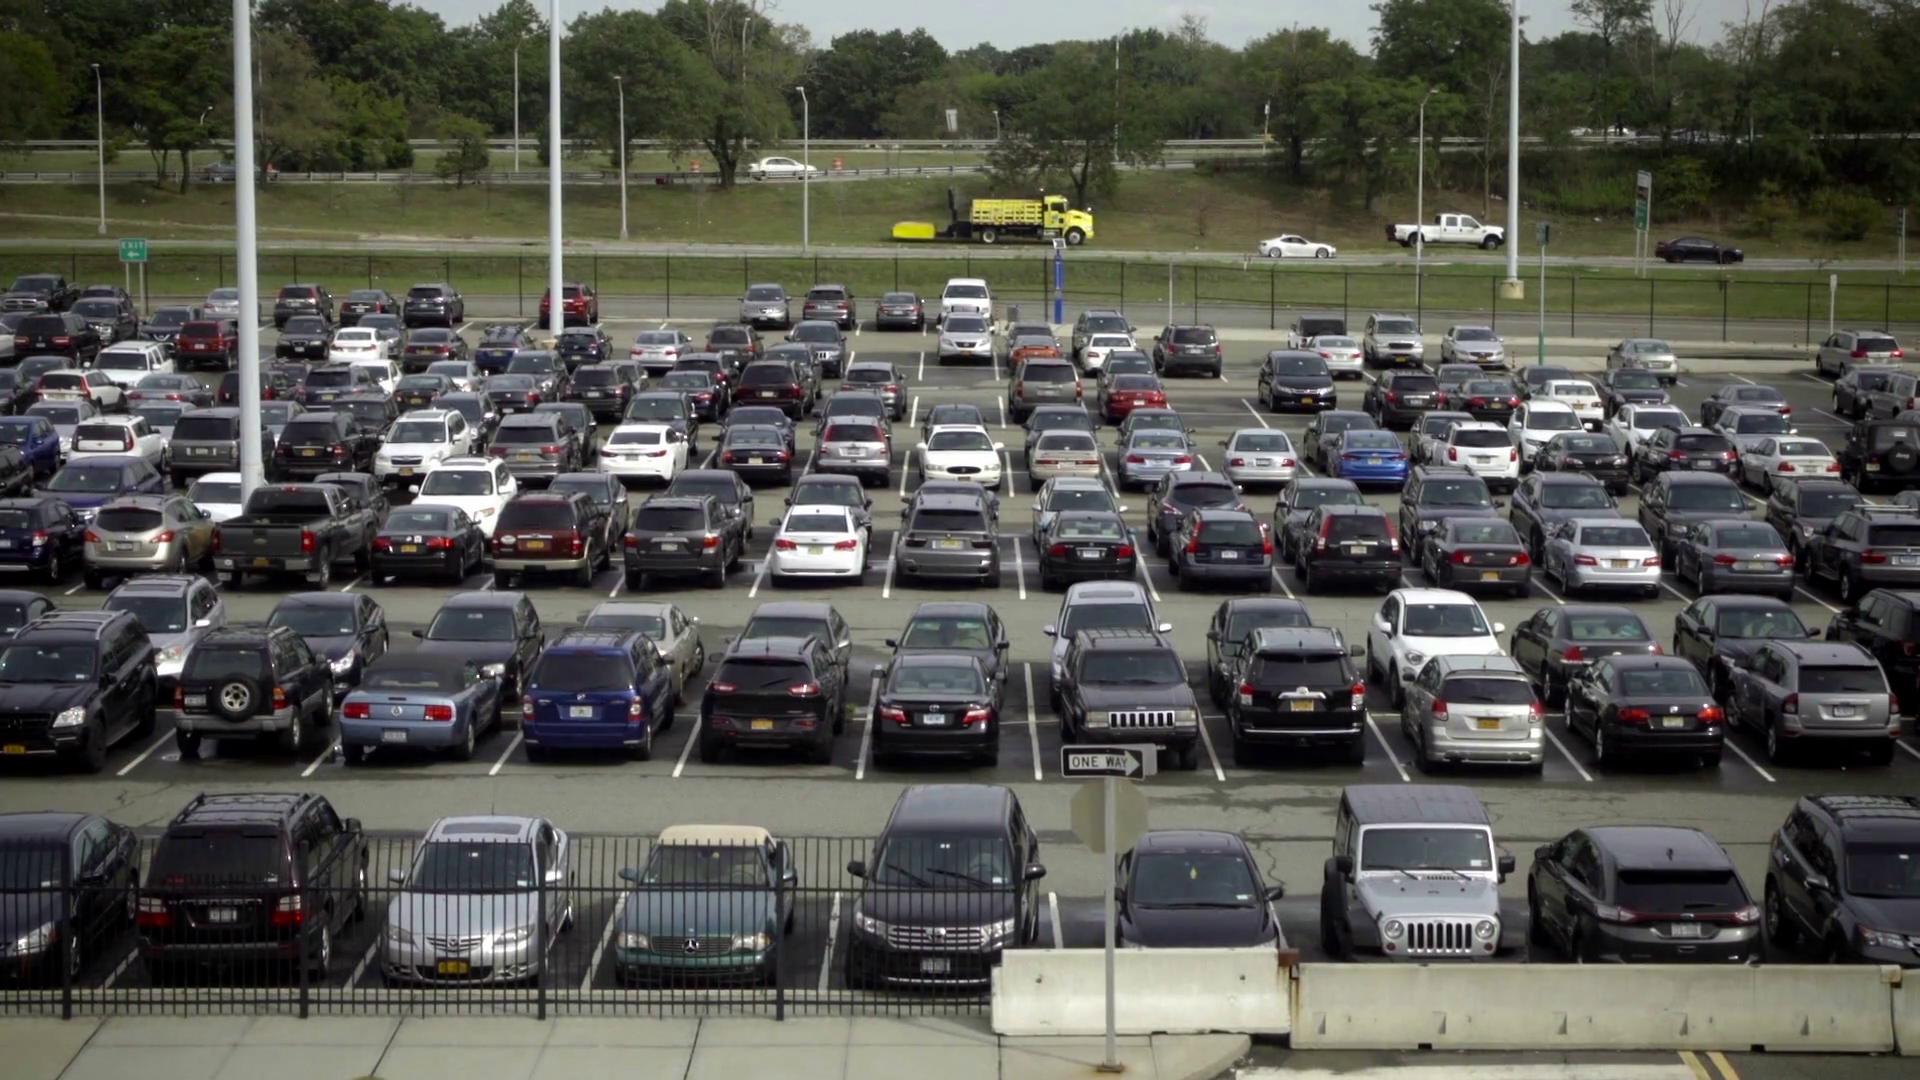 PNG HD Parking Lot